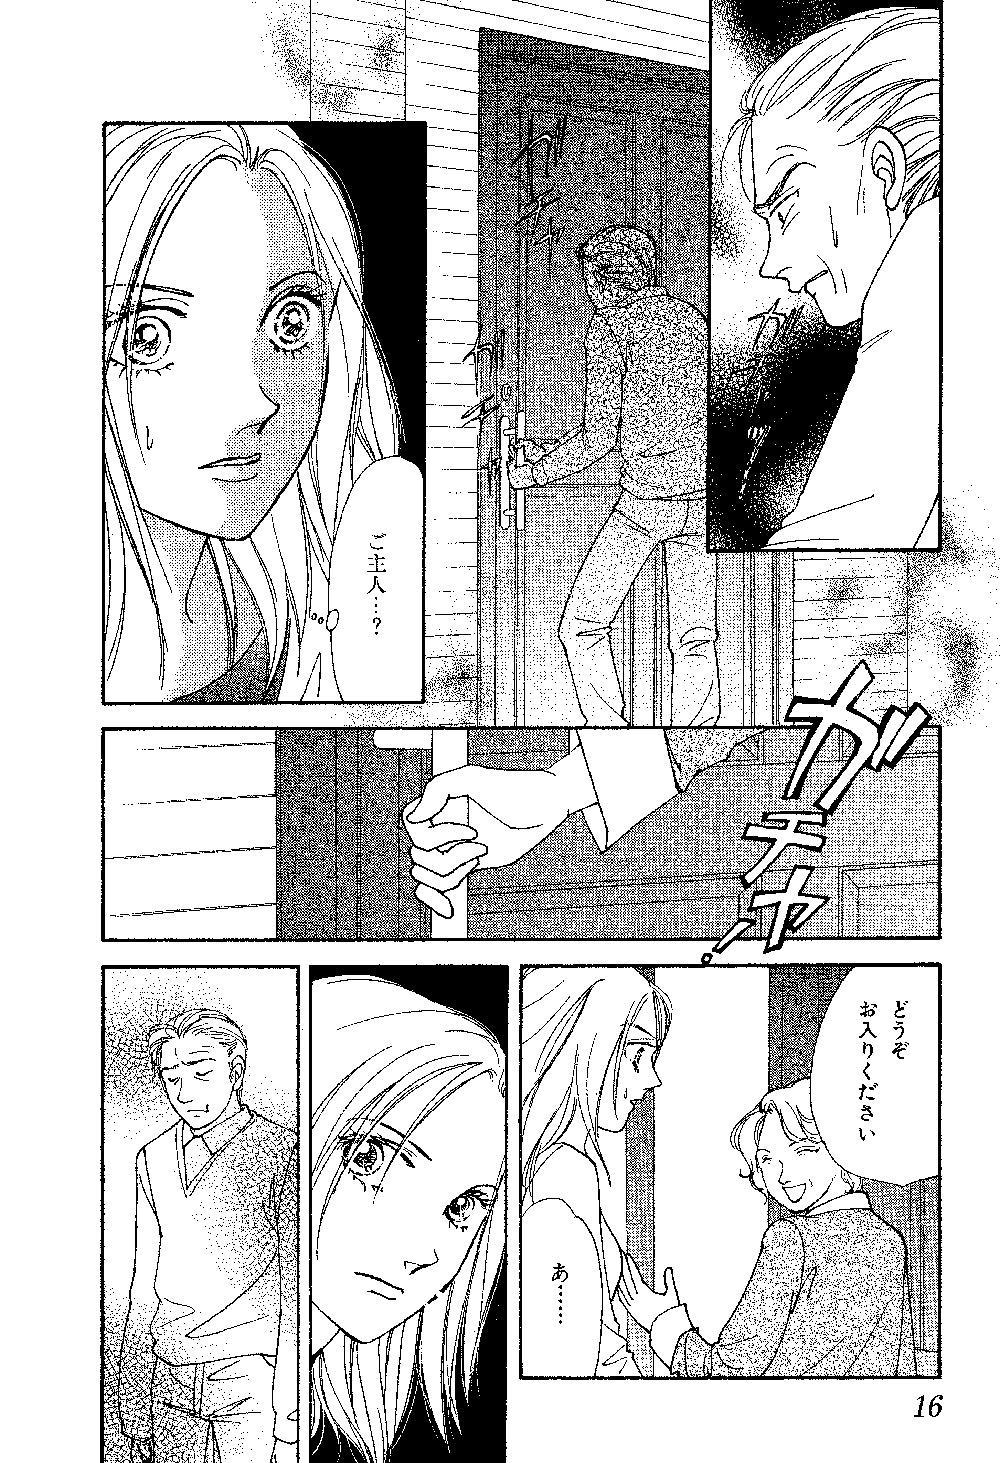 mayuri_0001_0016.jpg